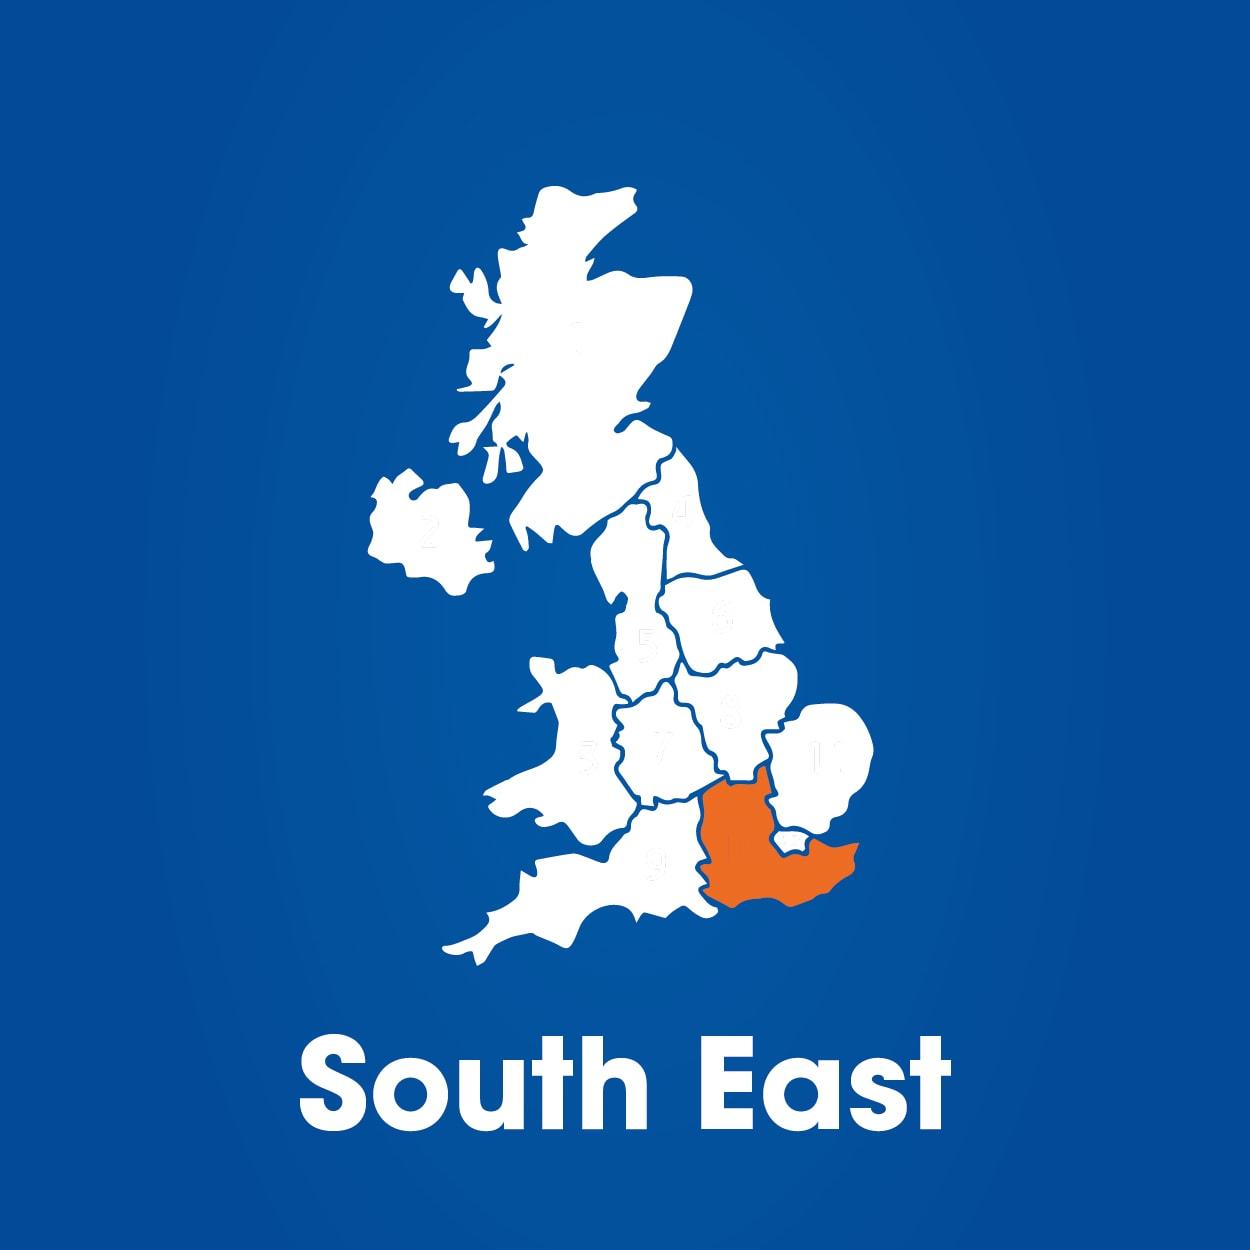 South East region on UK map